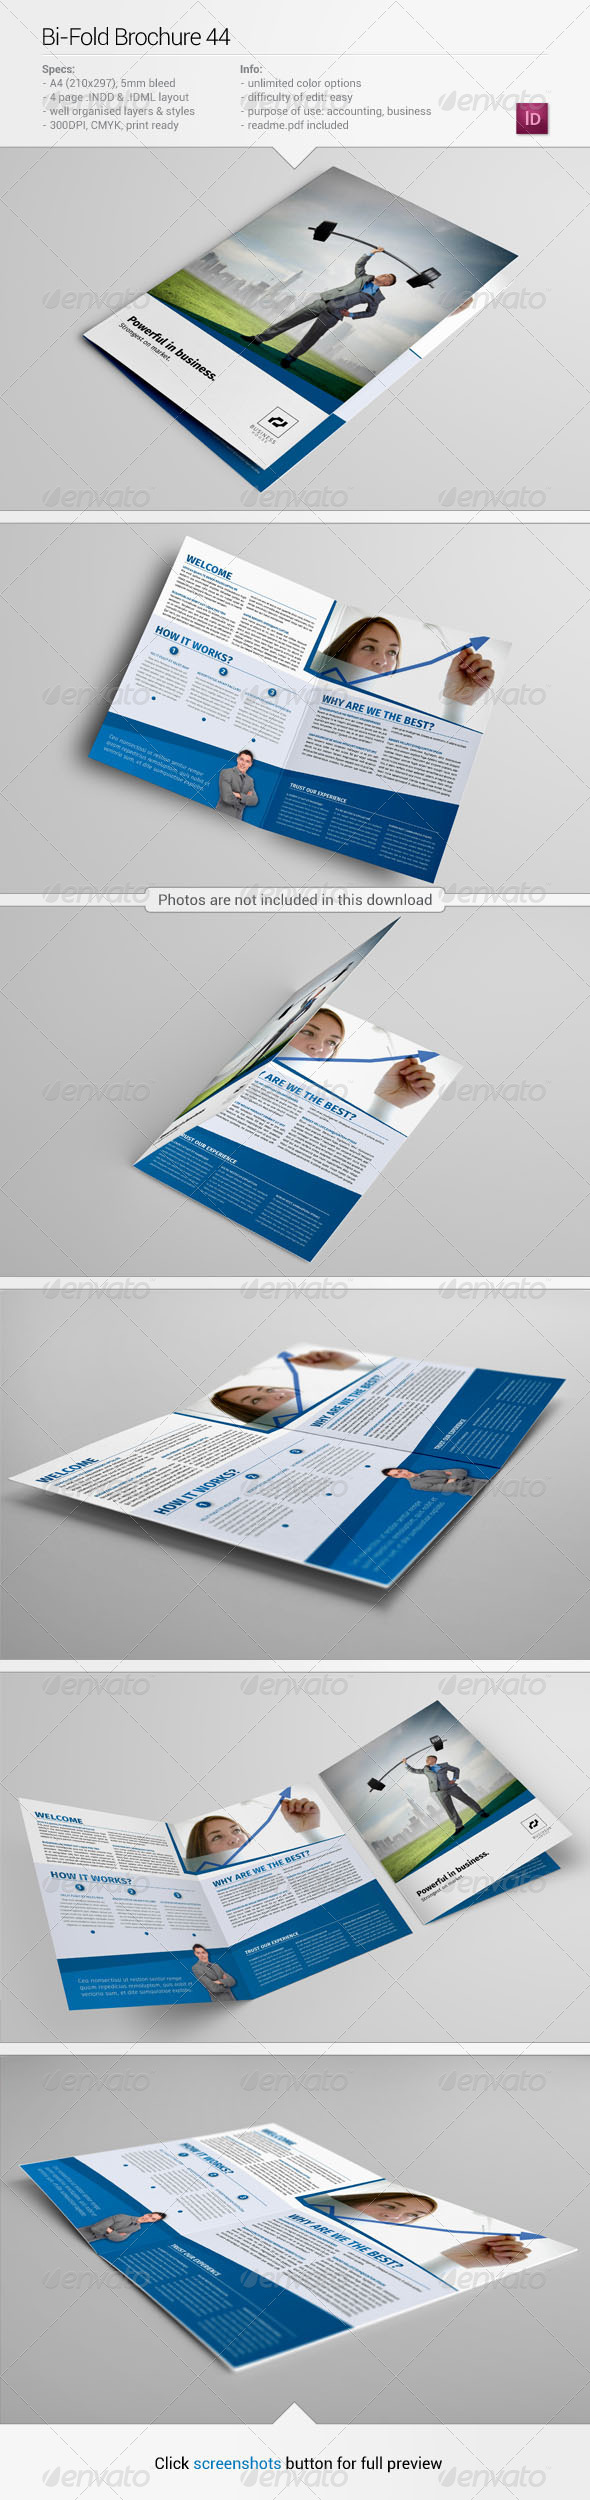 Bi-Fold Brochure 44 - Corporate Brochures